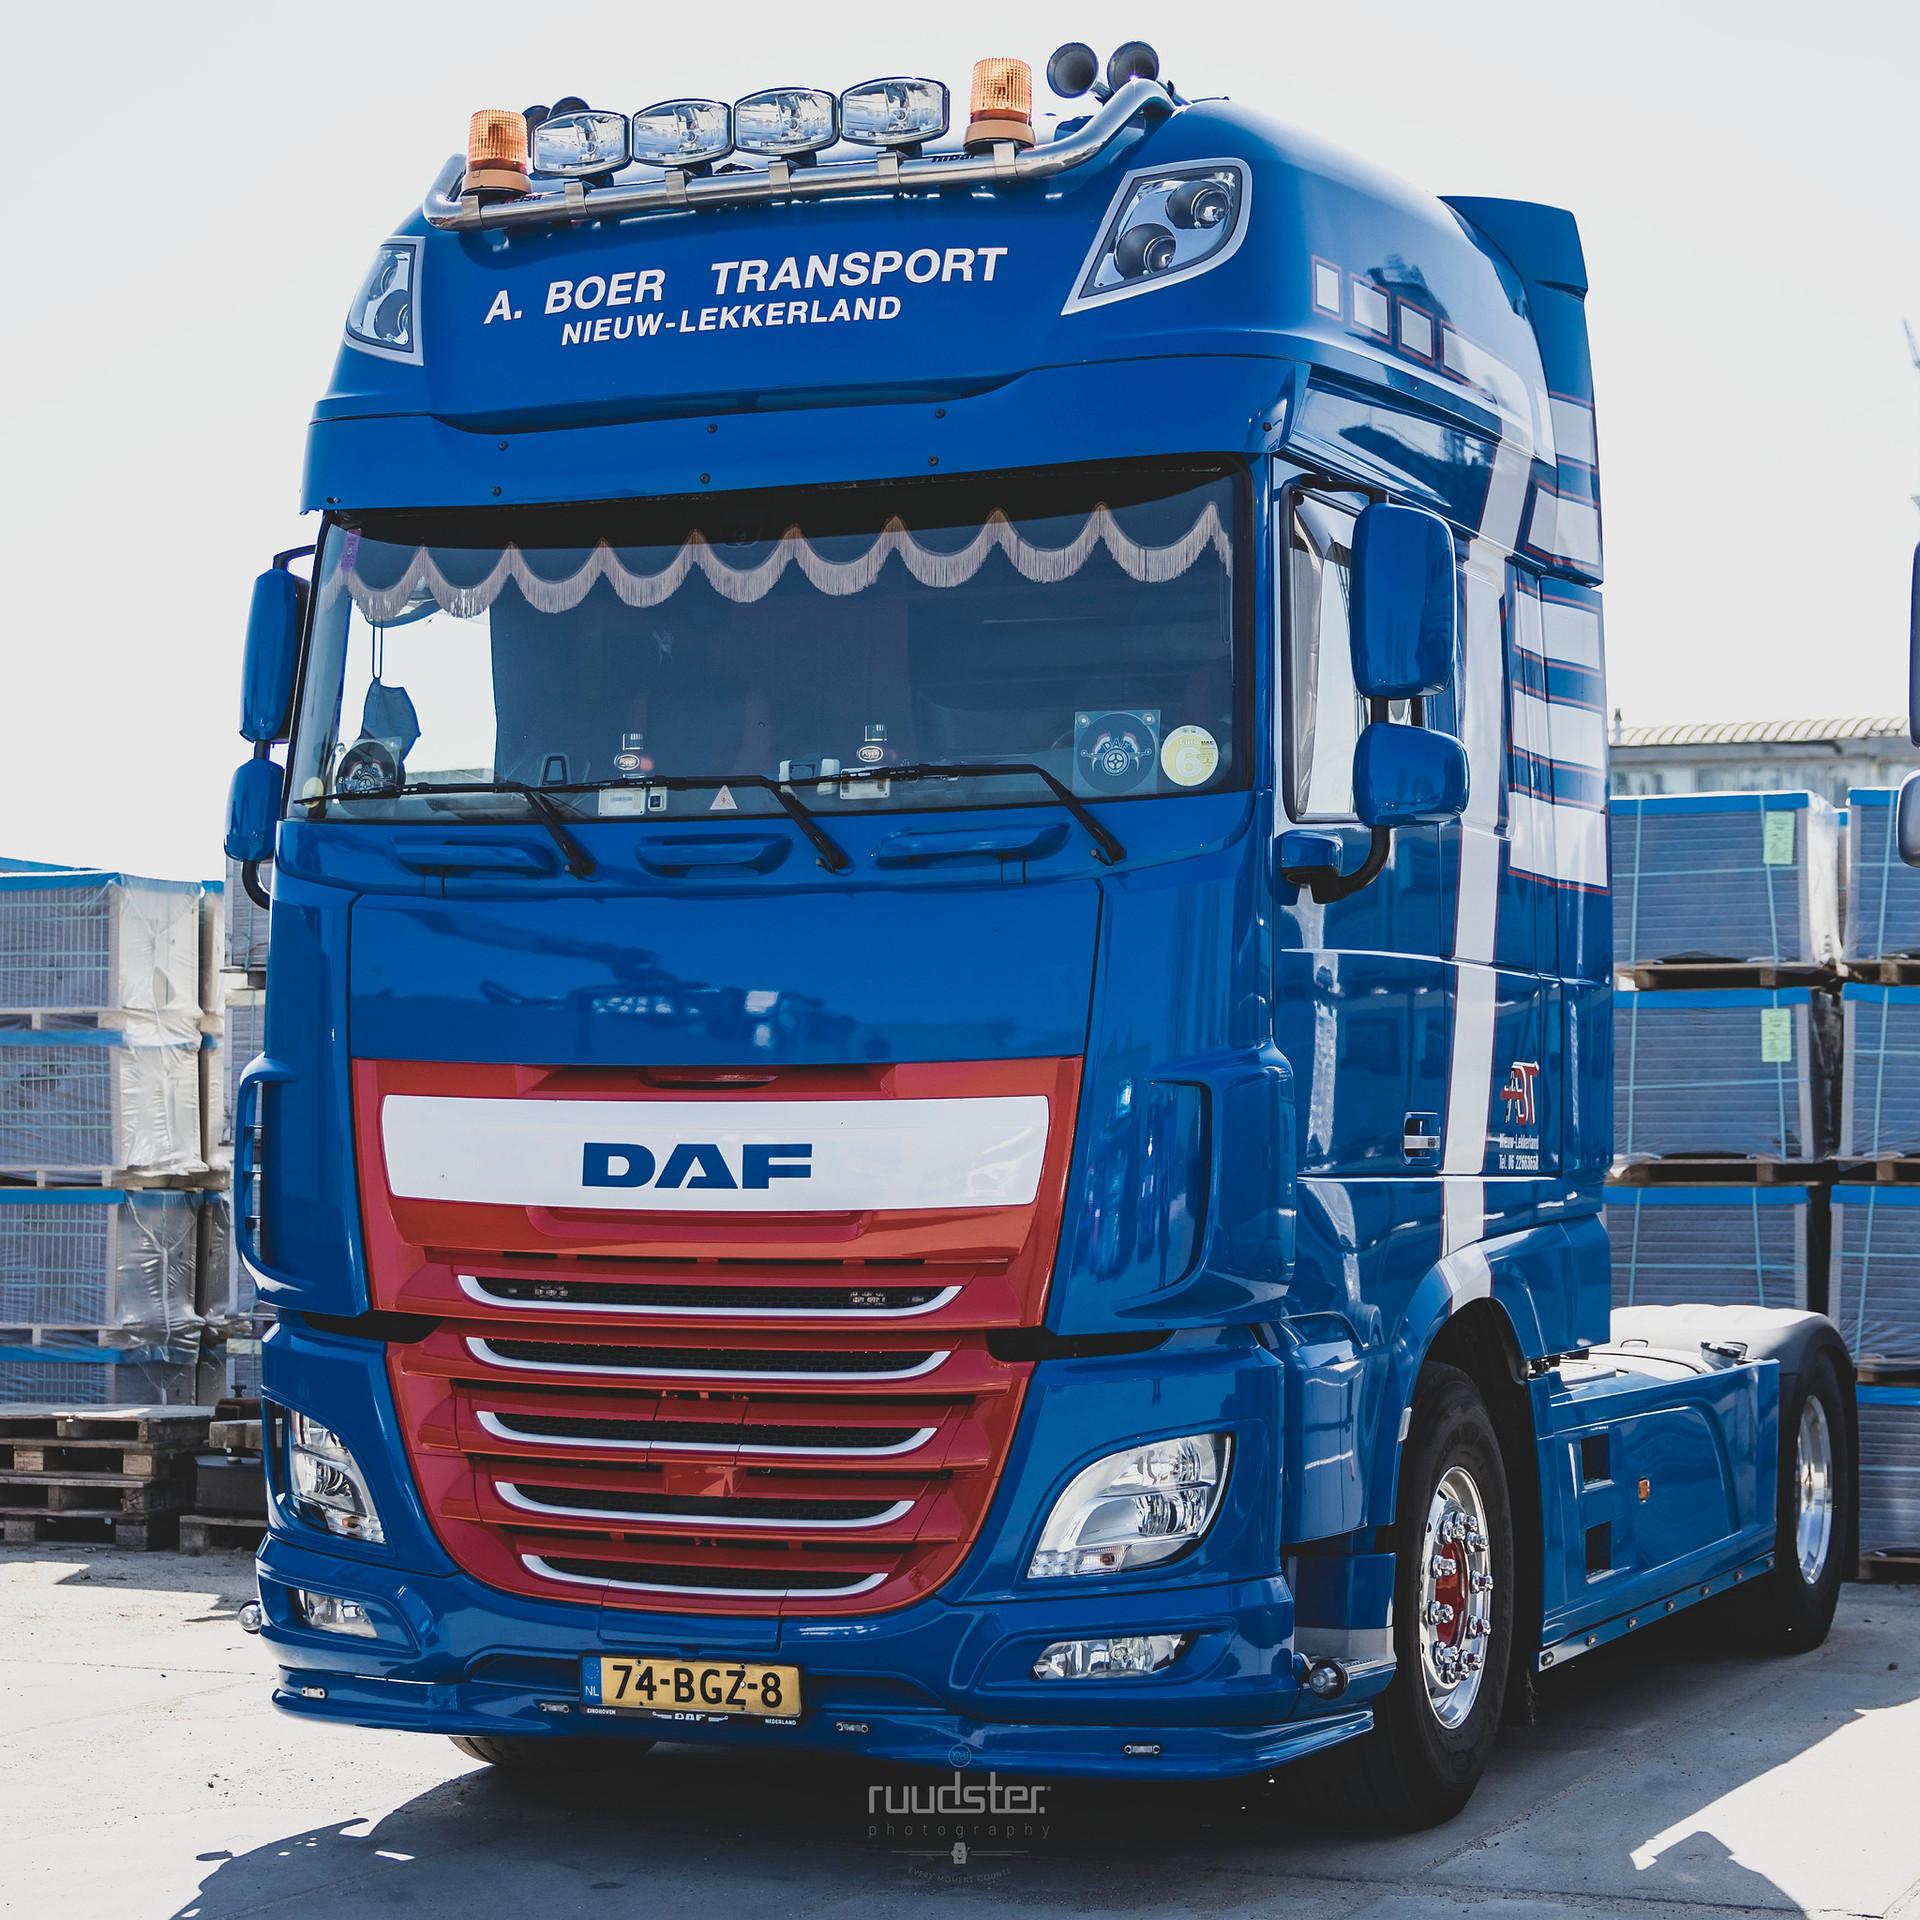 74-BGZ-8 | Build: 2016 - DAF XF106.460